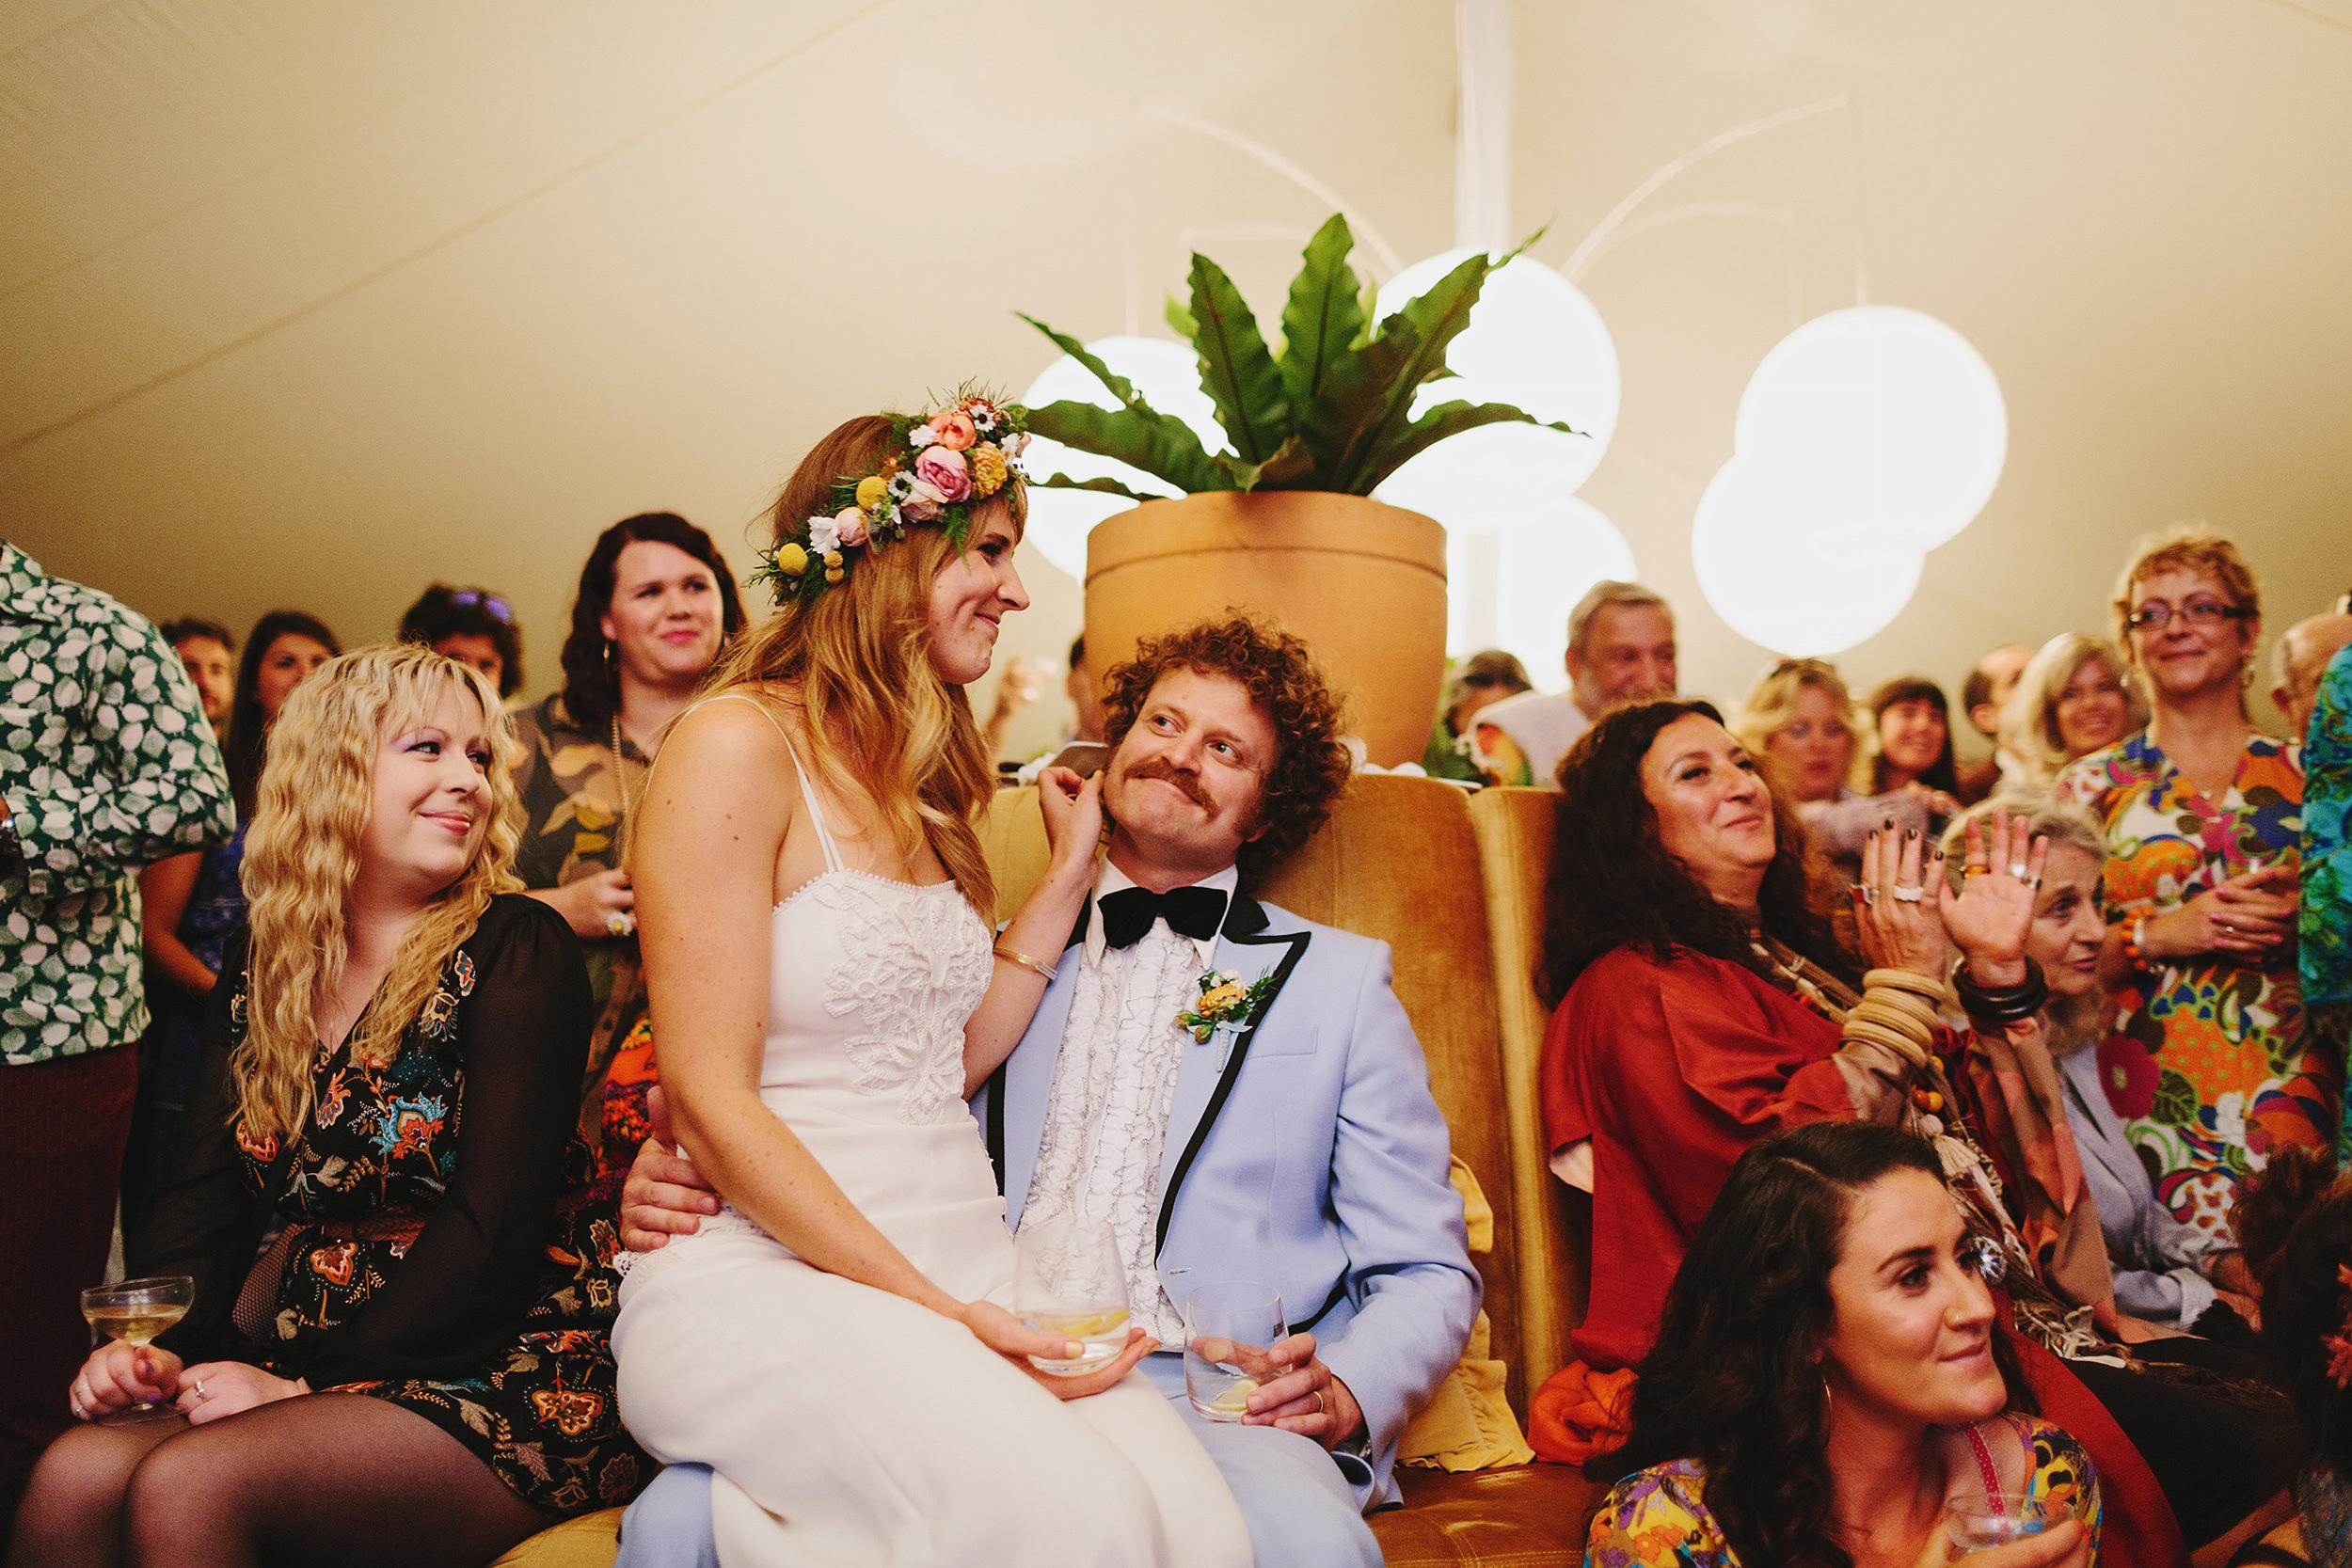 Melbourne_Vintage_Backyard_Wedding_Ben_Erin 093.JPG